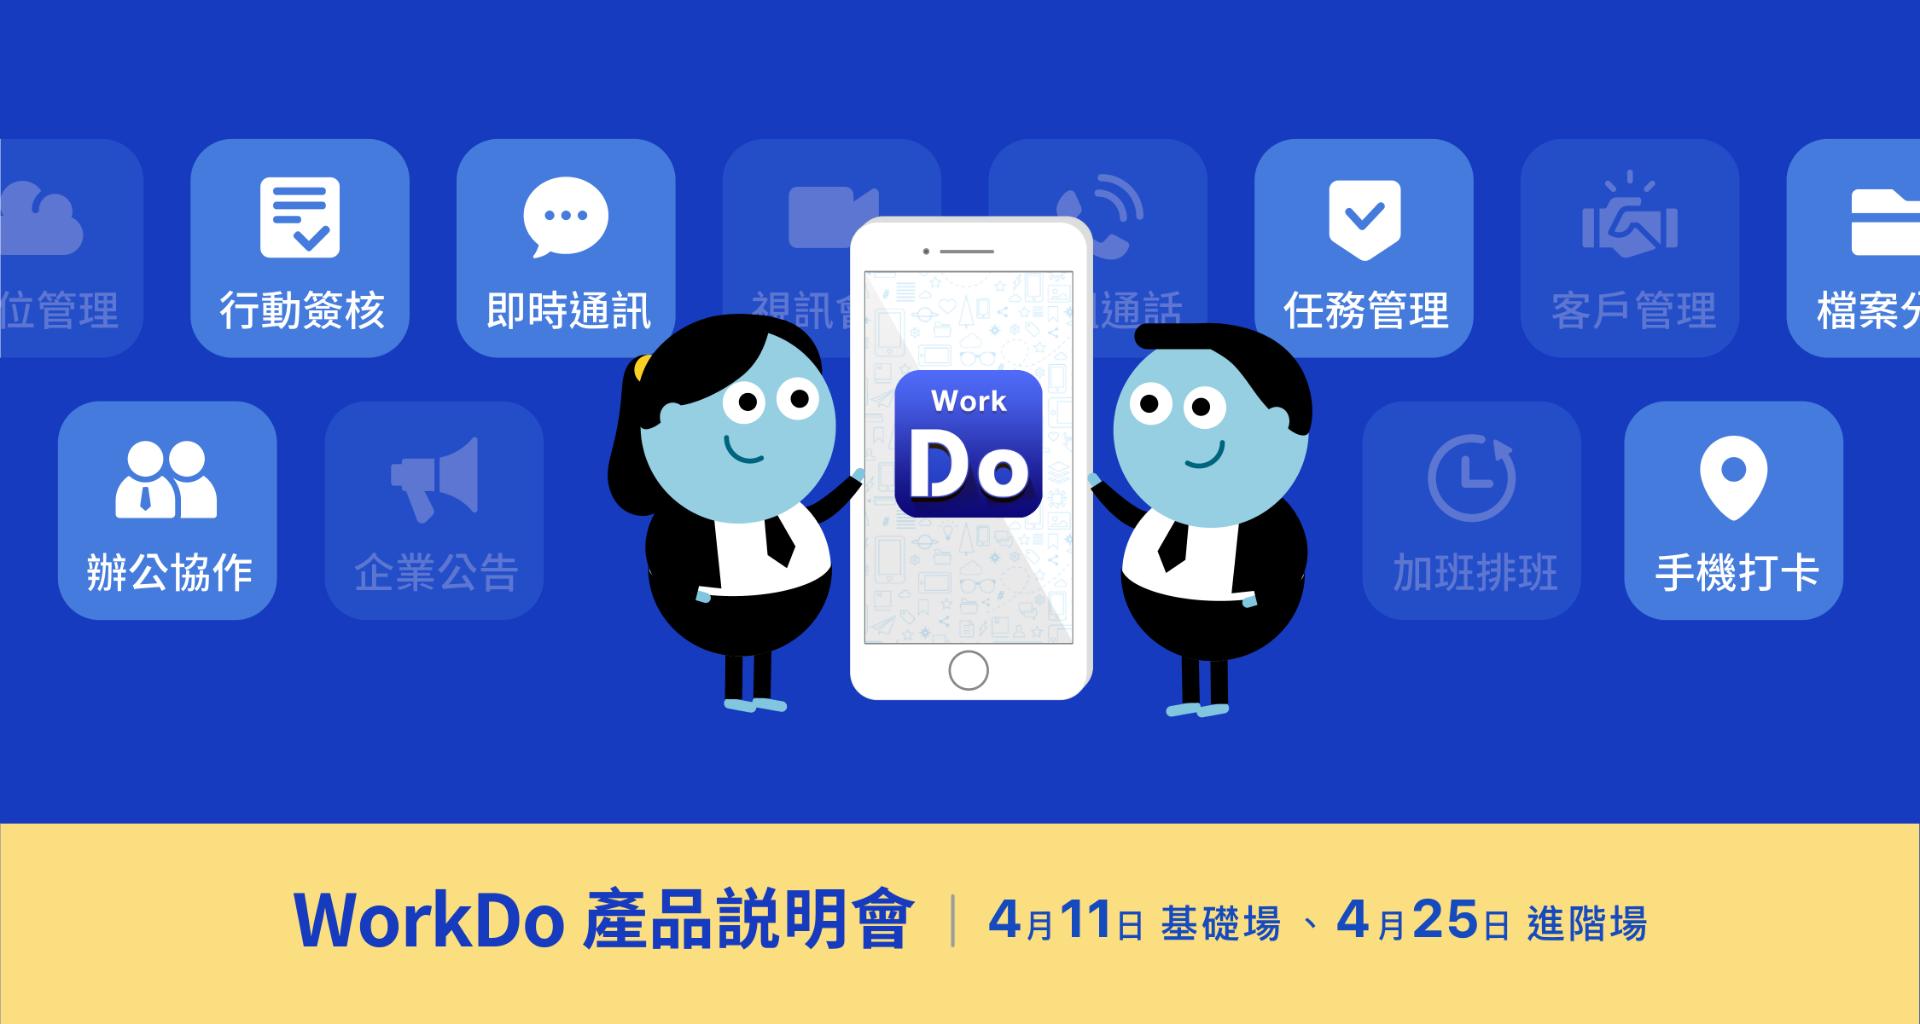 WorkDo All-in-One智慧行動辦公應用 企業說明會四月說明會